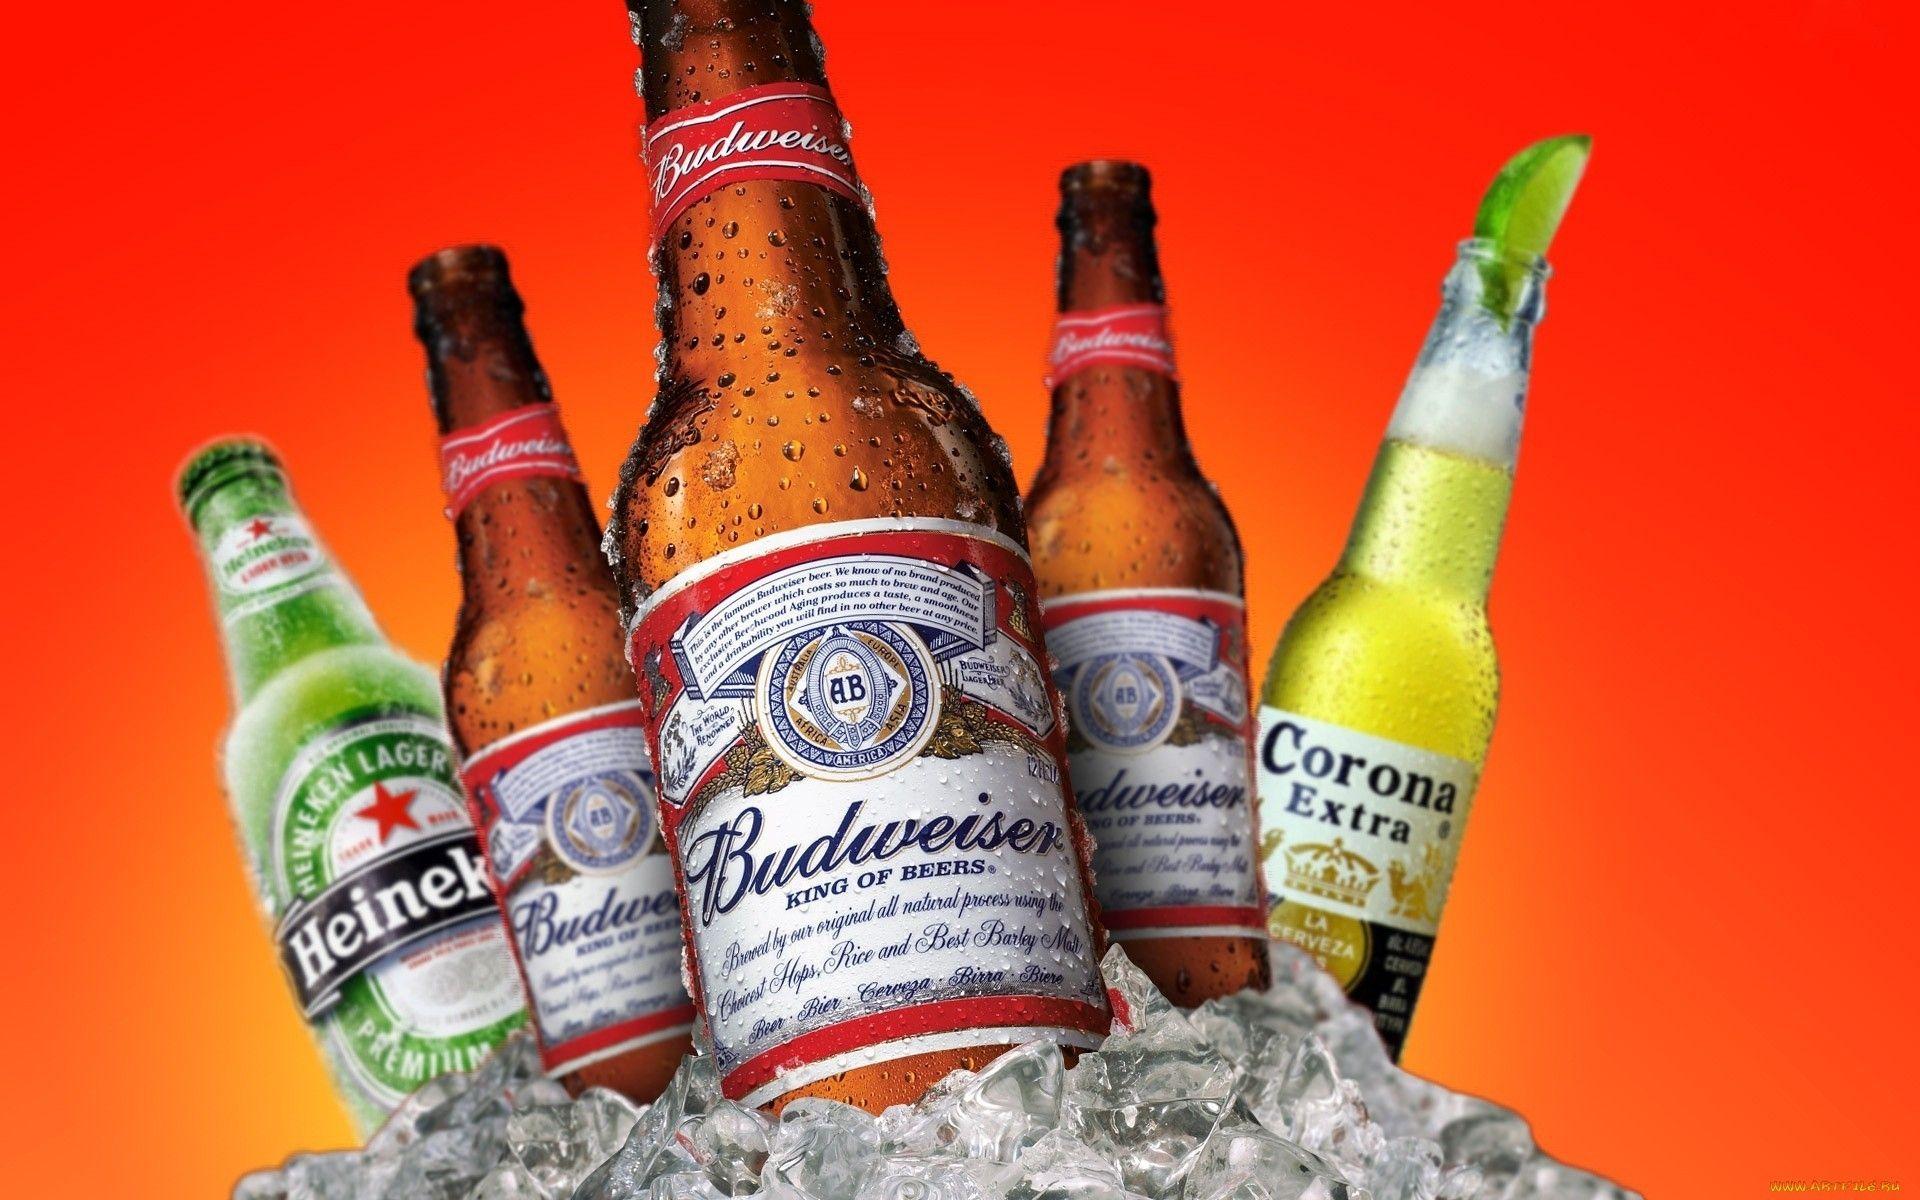 Tbudweiser beer budweiser heineken corona extra drops ice beer bottles my wallpapers ice - Budweiser beer pictures ...